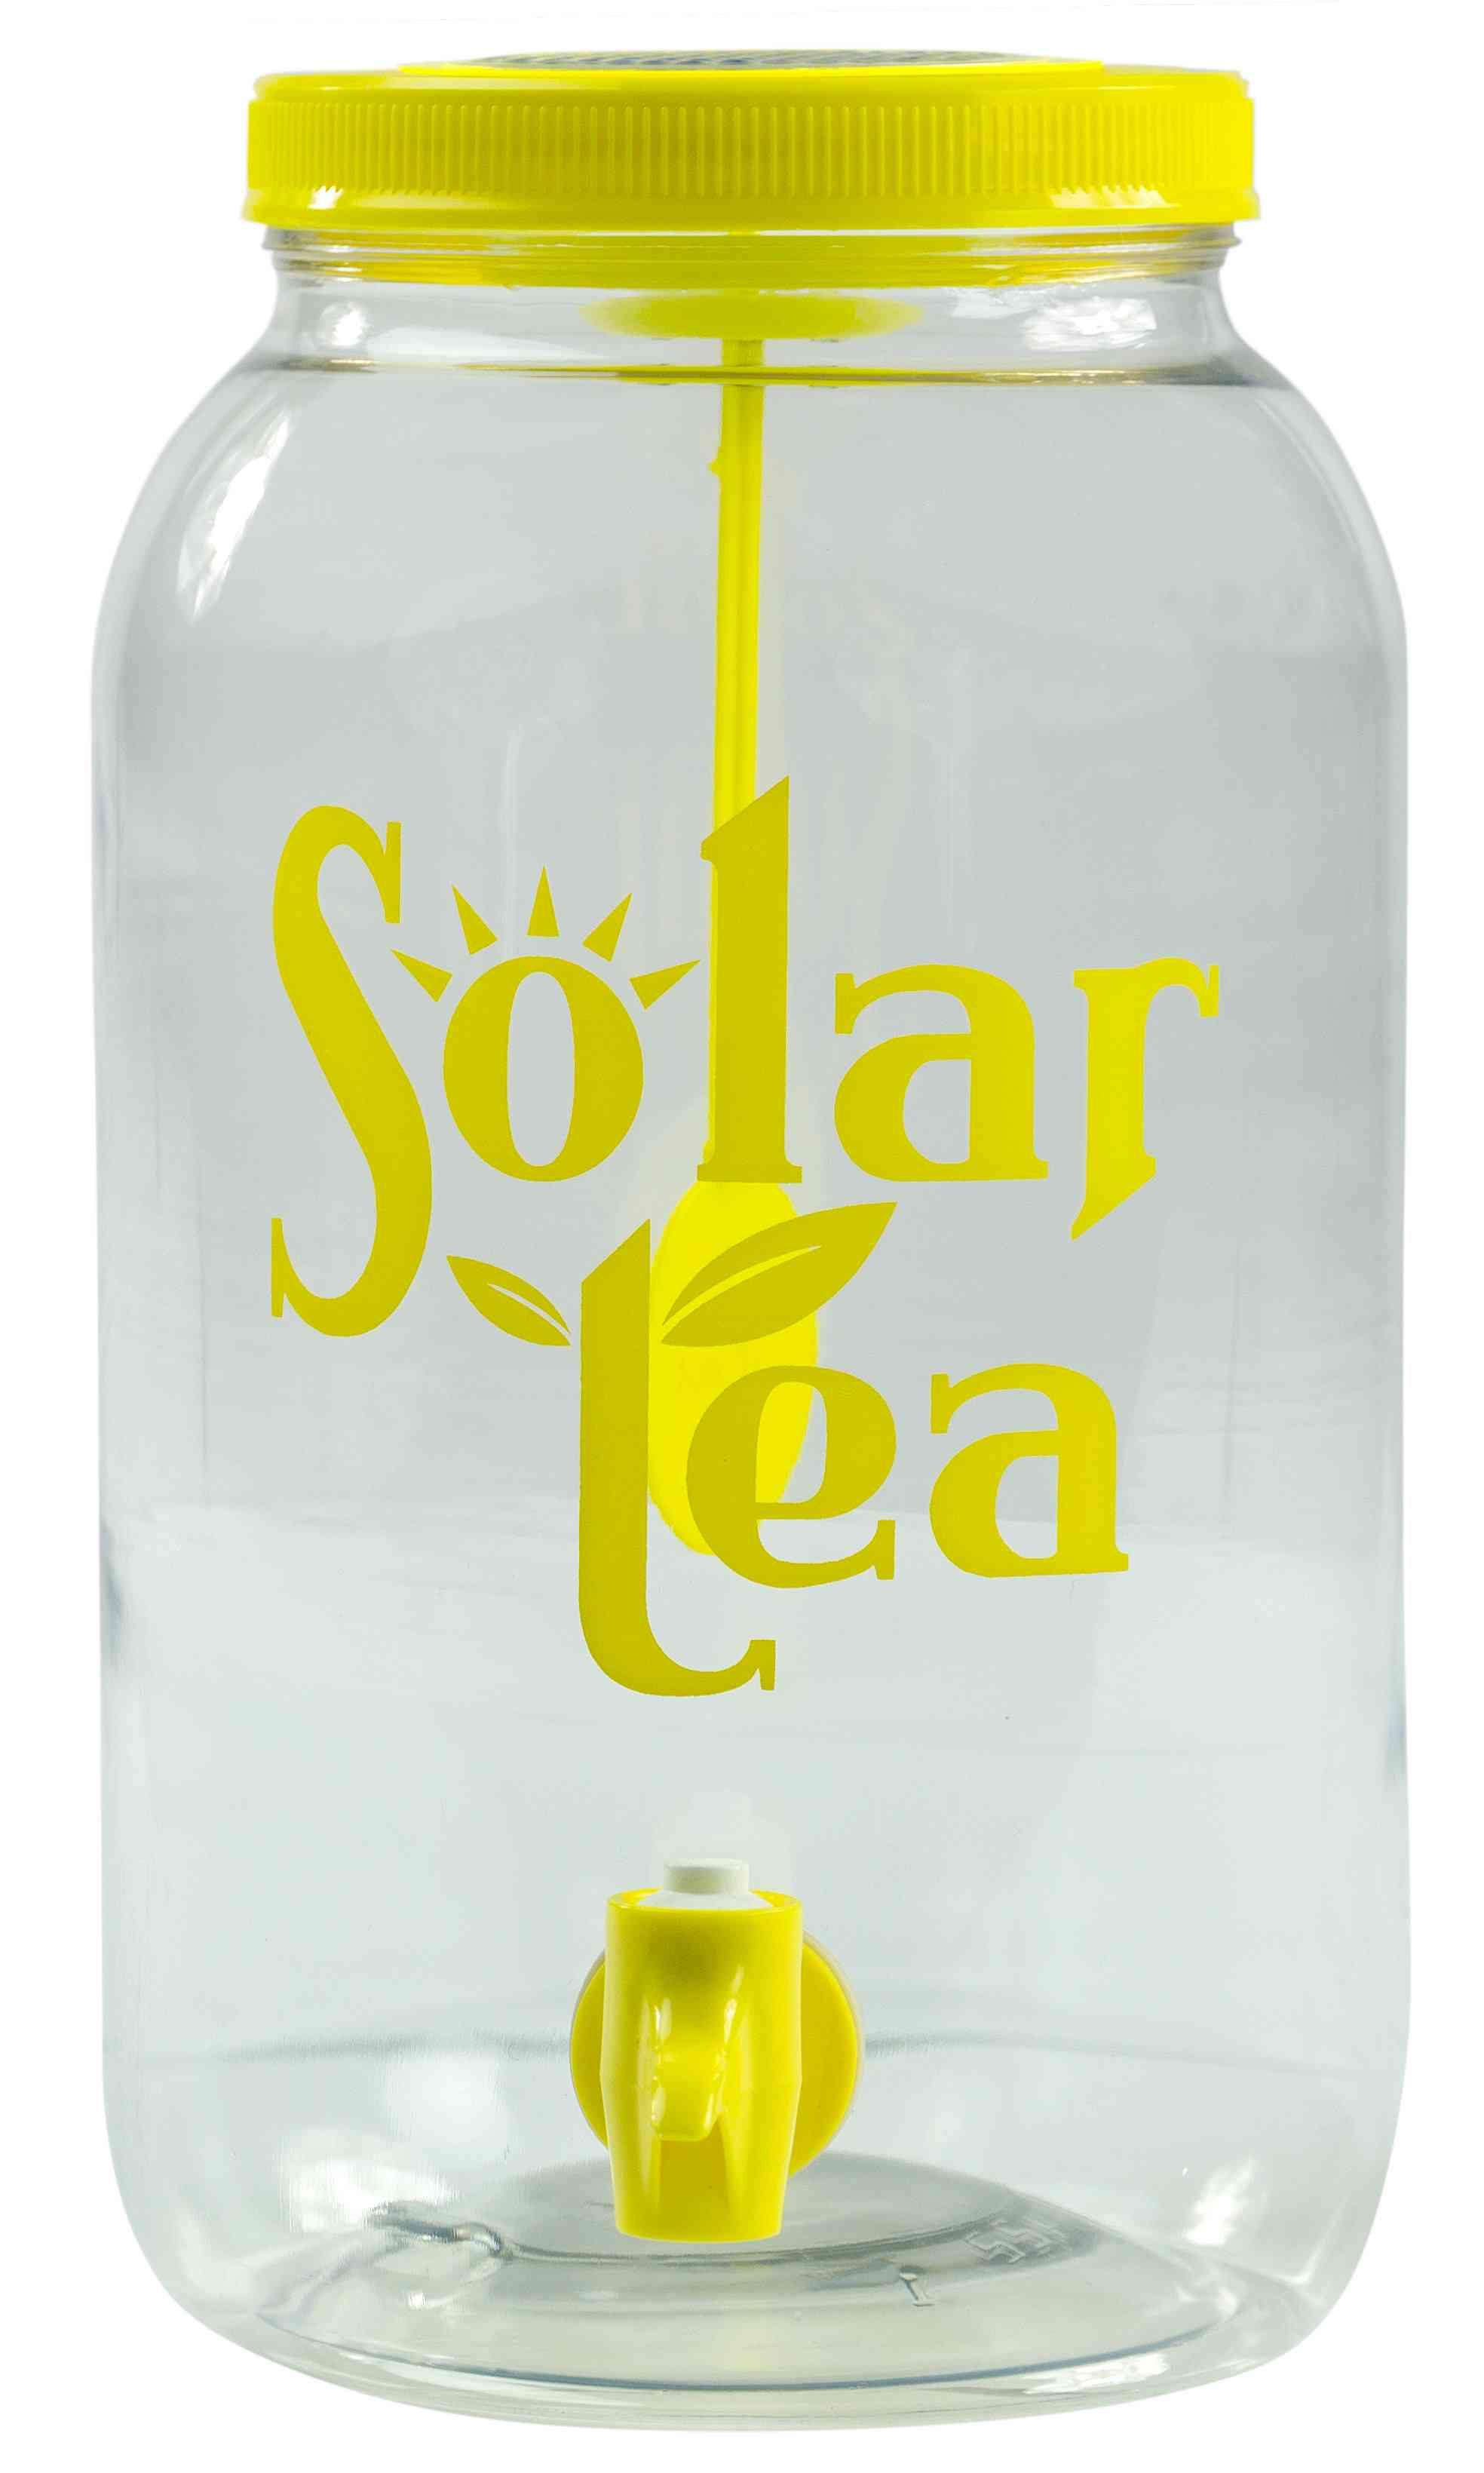 solar-tea